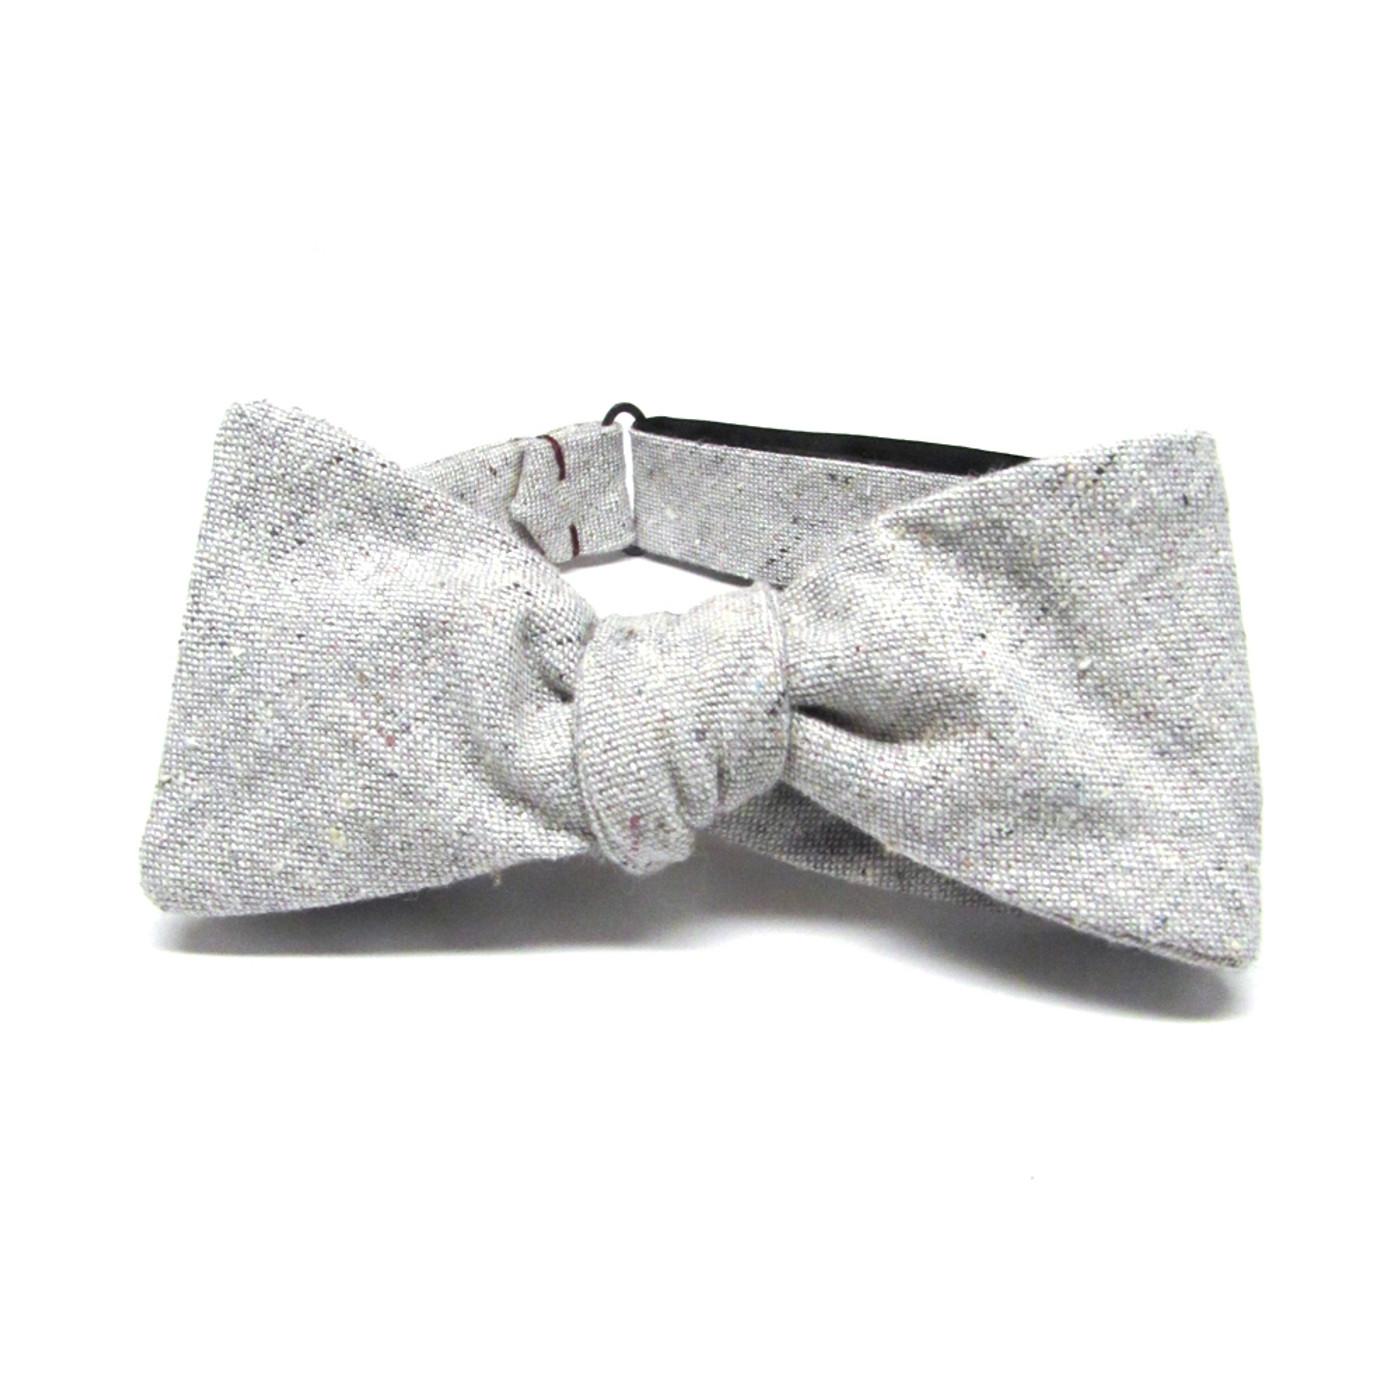 Heathered Grey Bow Tie